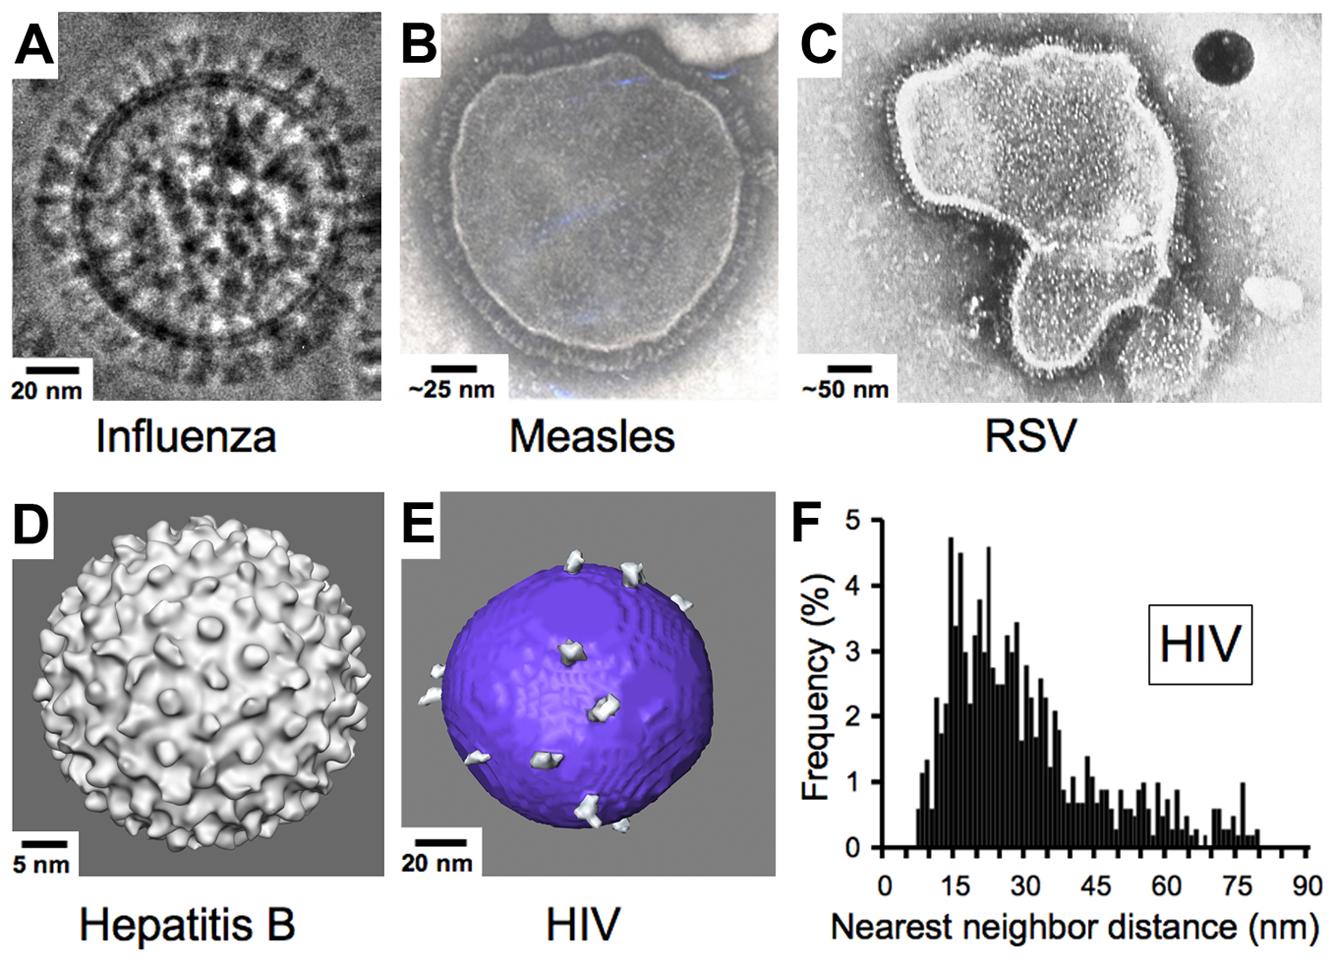 Comparison of enveloped viruses and nearest neighbor distances for HIV envelope spikes.